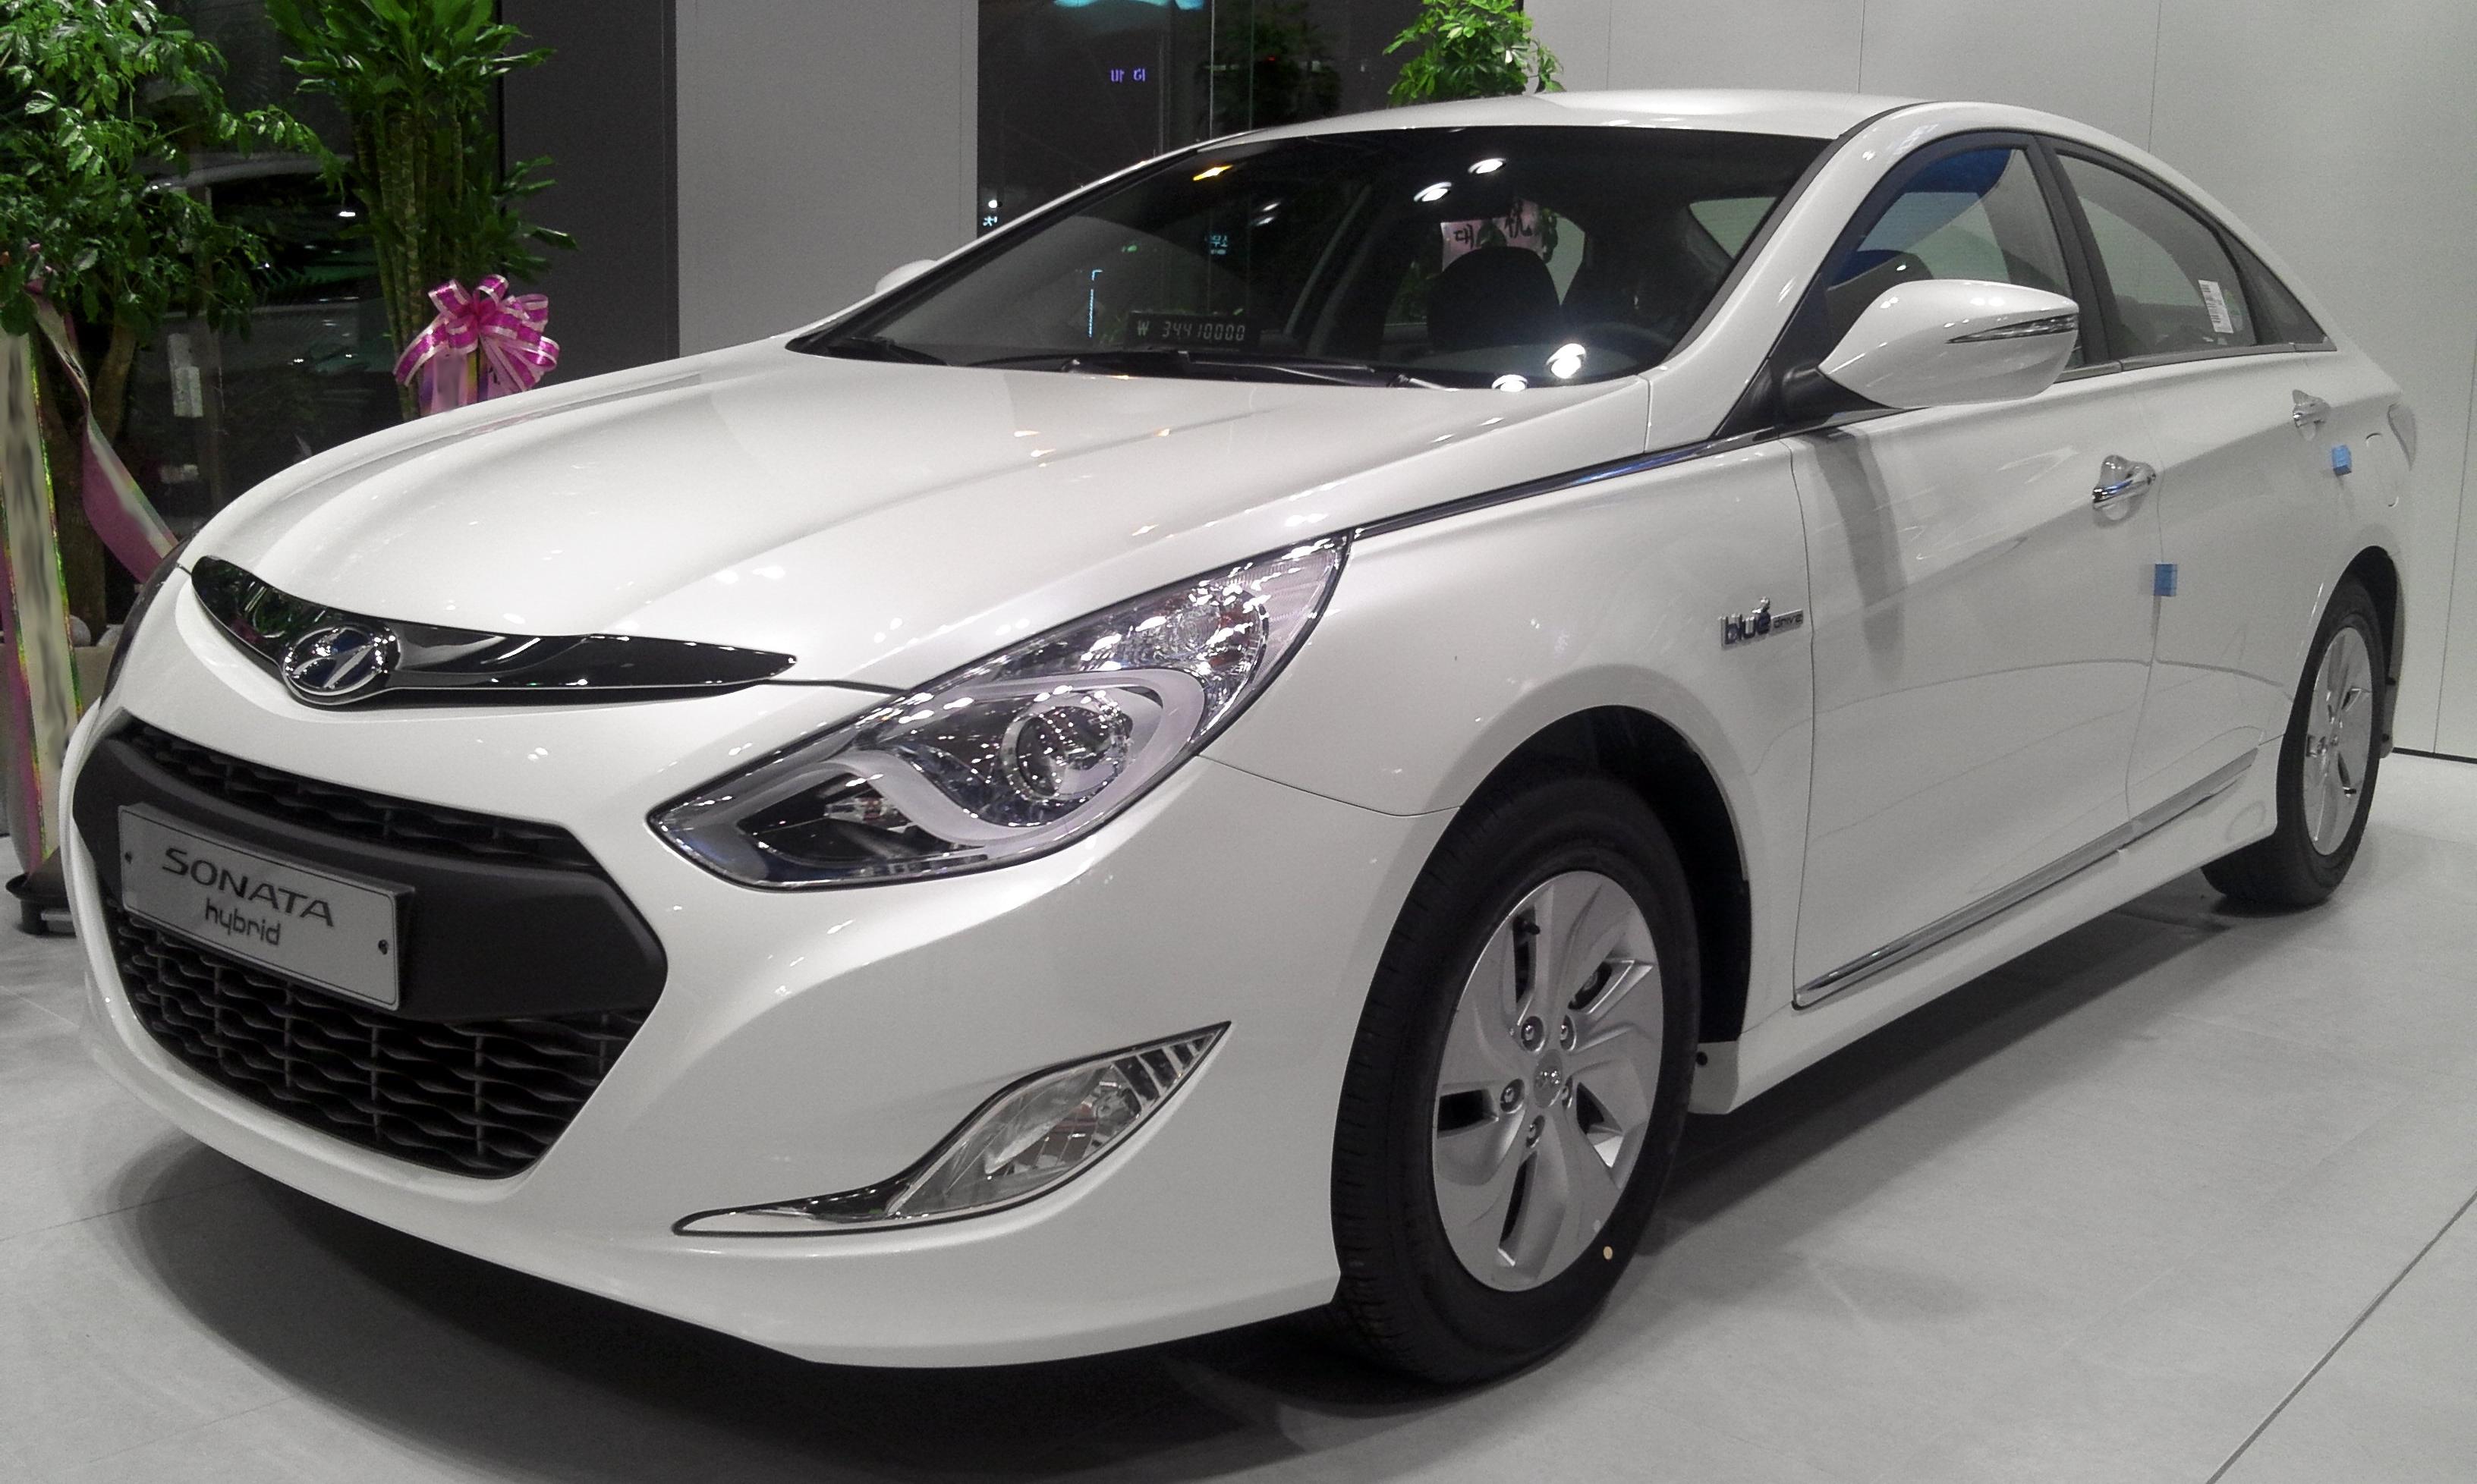 Hyundai Sonata Hybrid Review Car And Driver